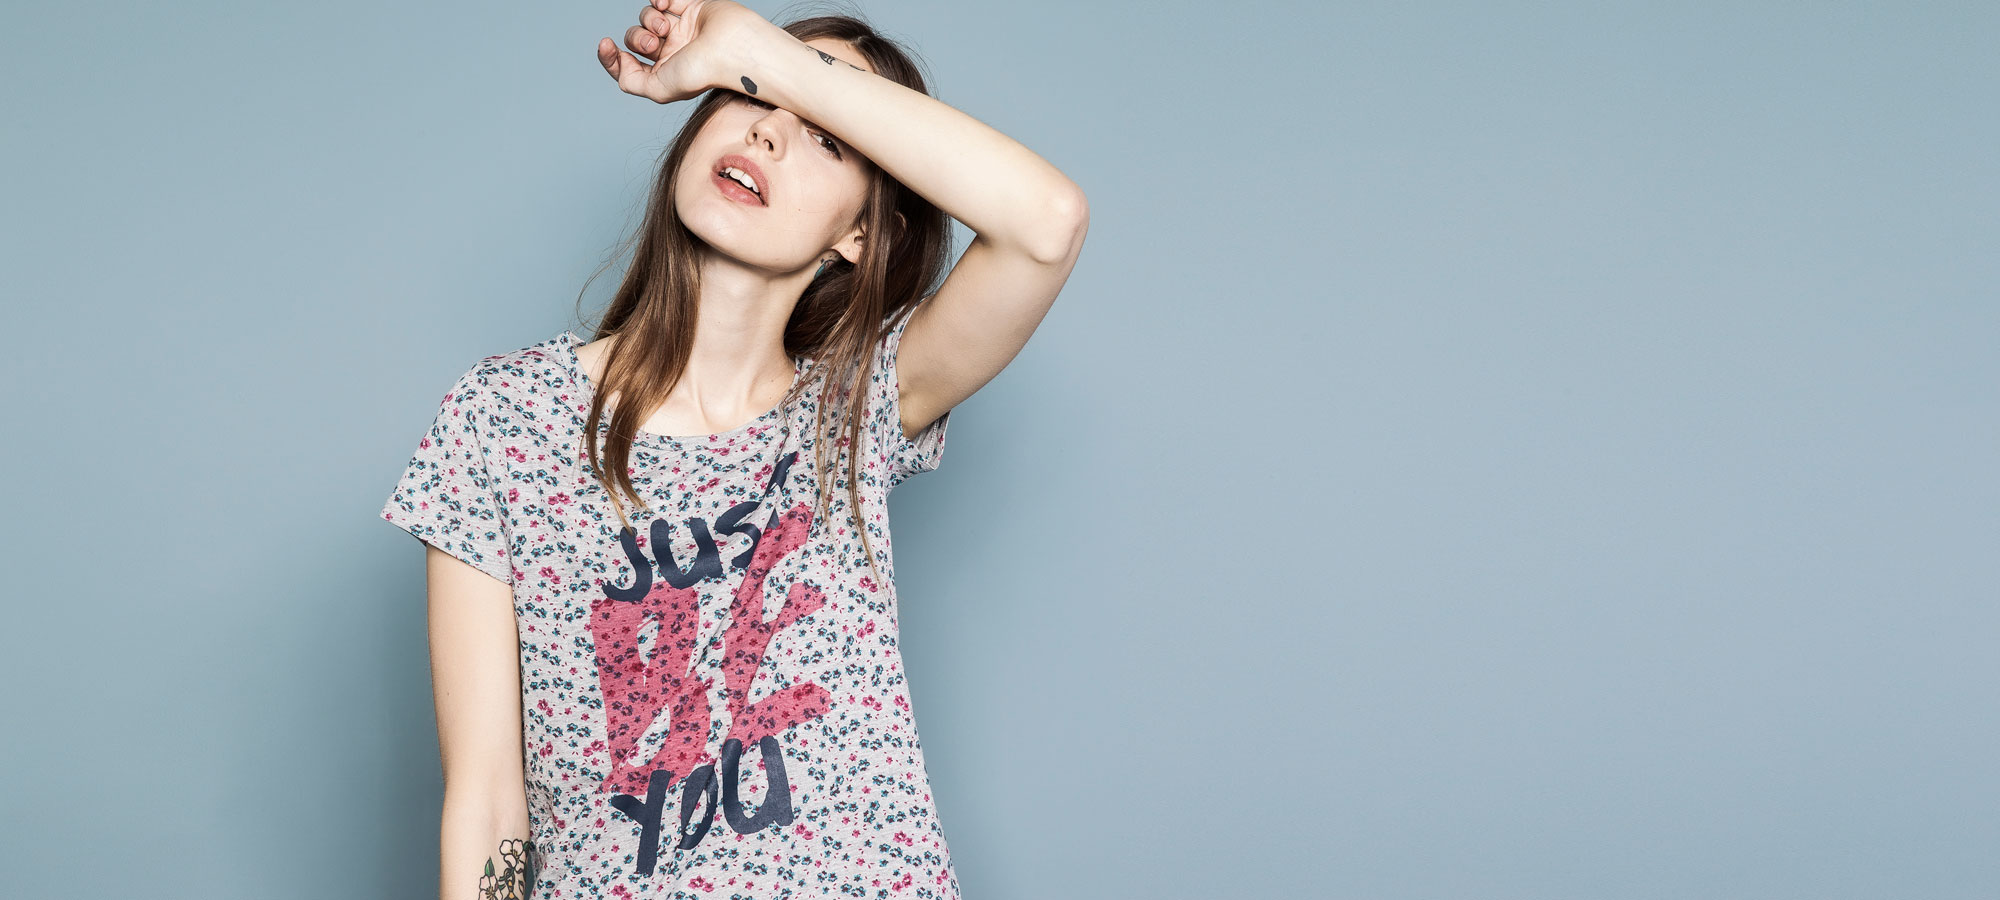 T-shirt, £9.99, Pull & Bear